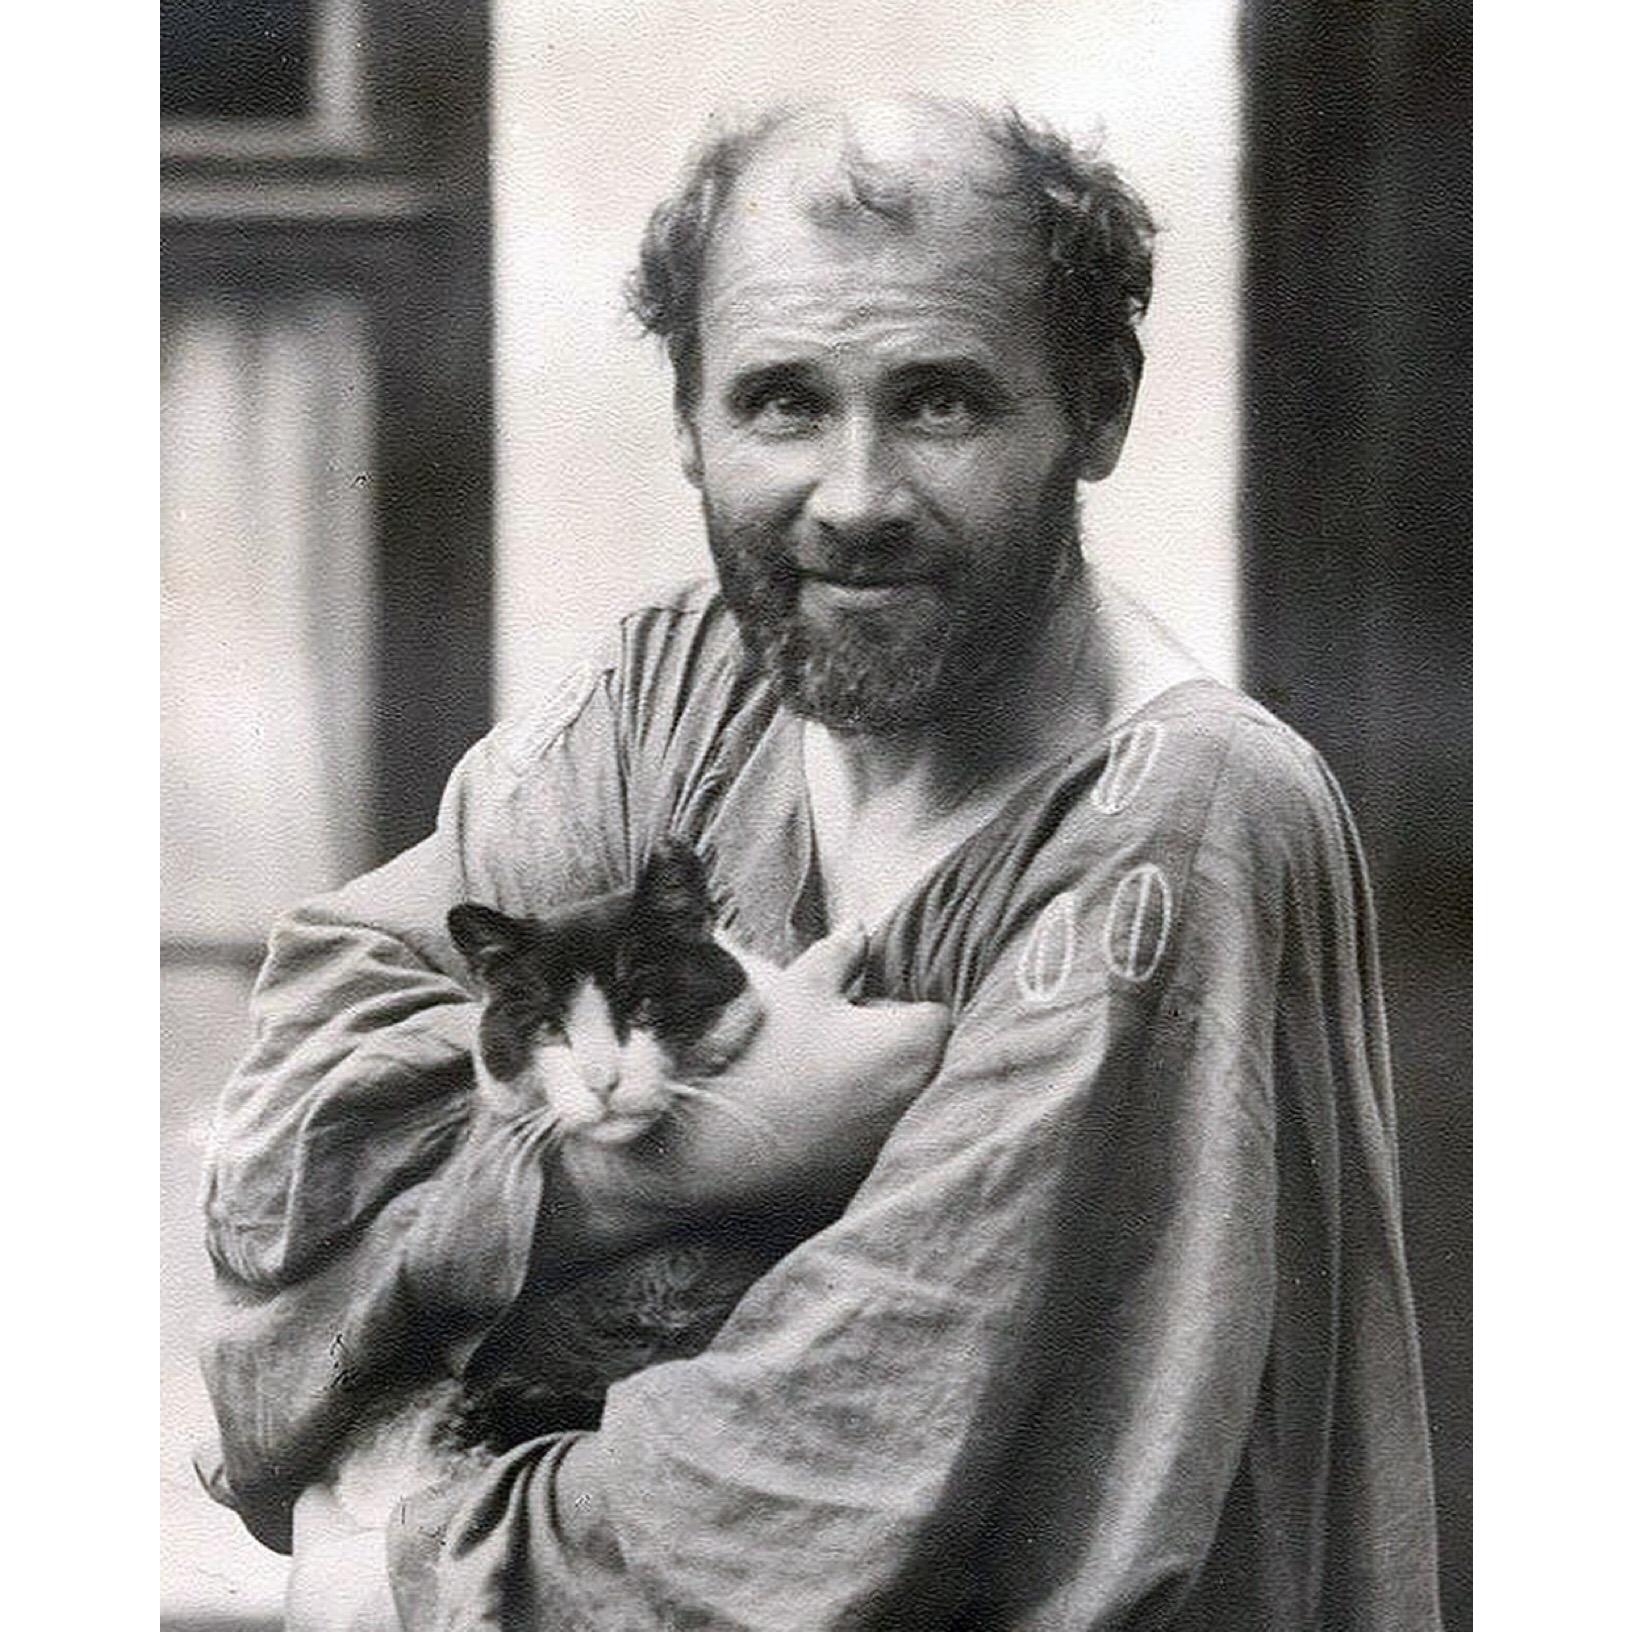 Gustav Klimt and his Cat, Katze, at his Studio, c. 1912